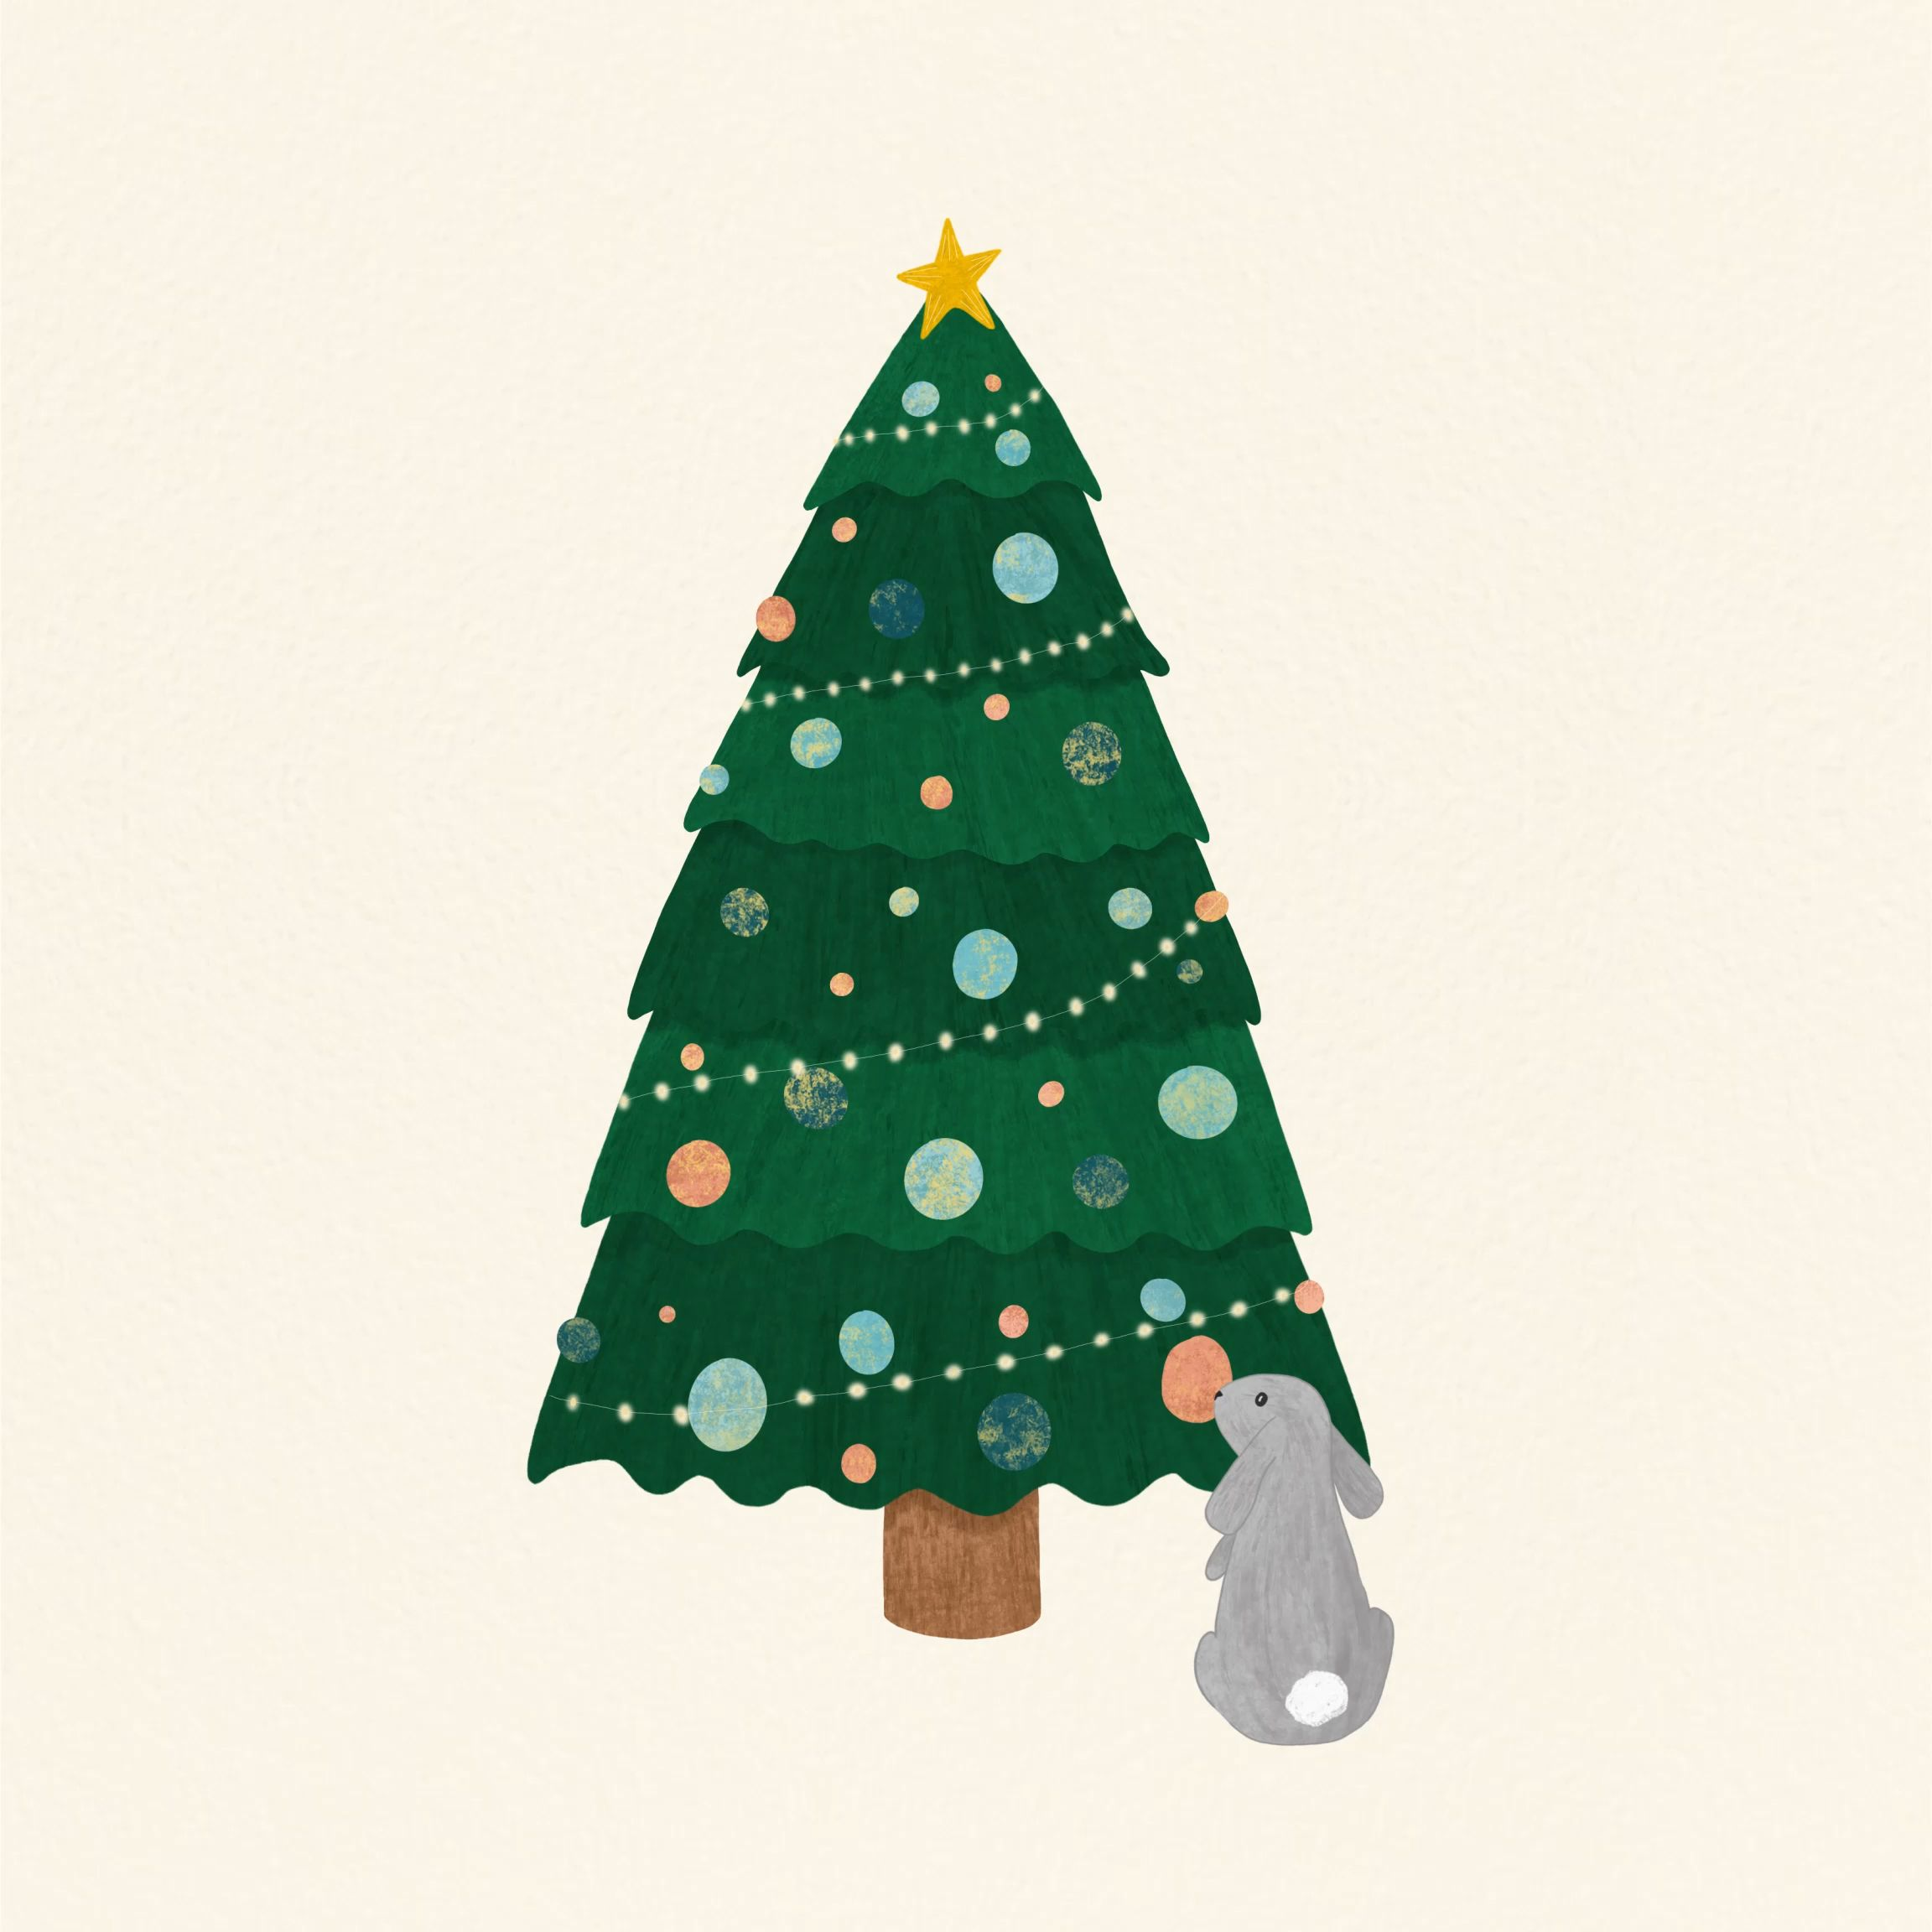 Illustration Christmas Christmasillustration Christmastree Bunny Drawing Christmas Tree Drawing Christmas Illustration Xmas Wallpaper